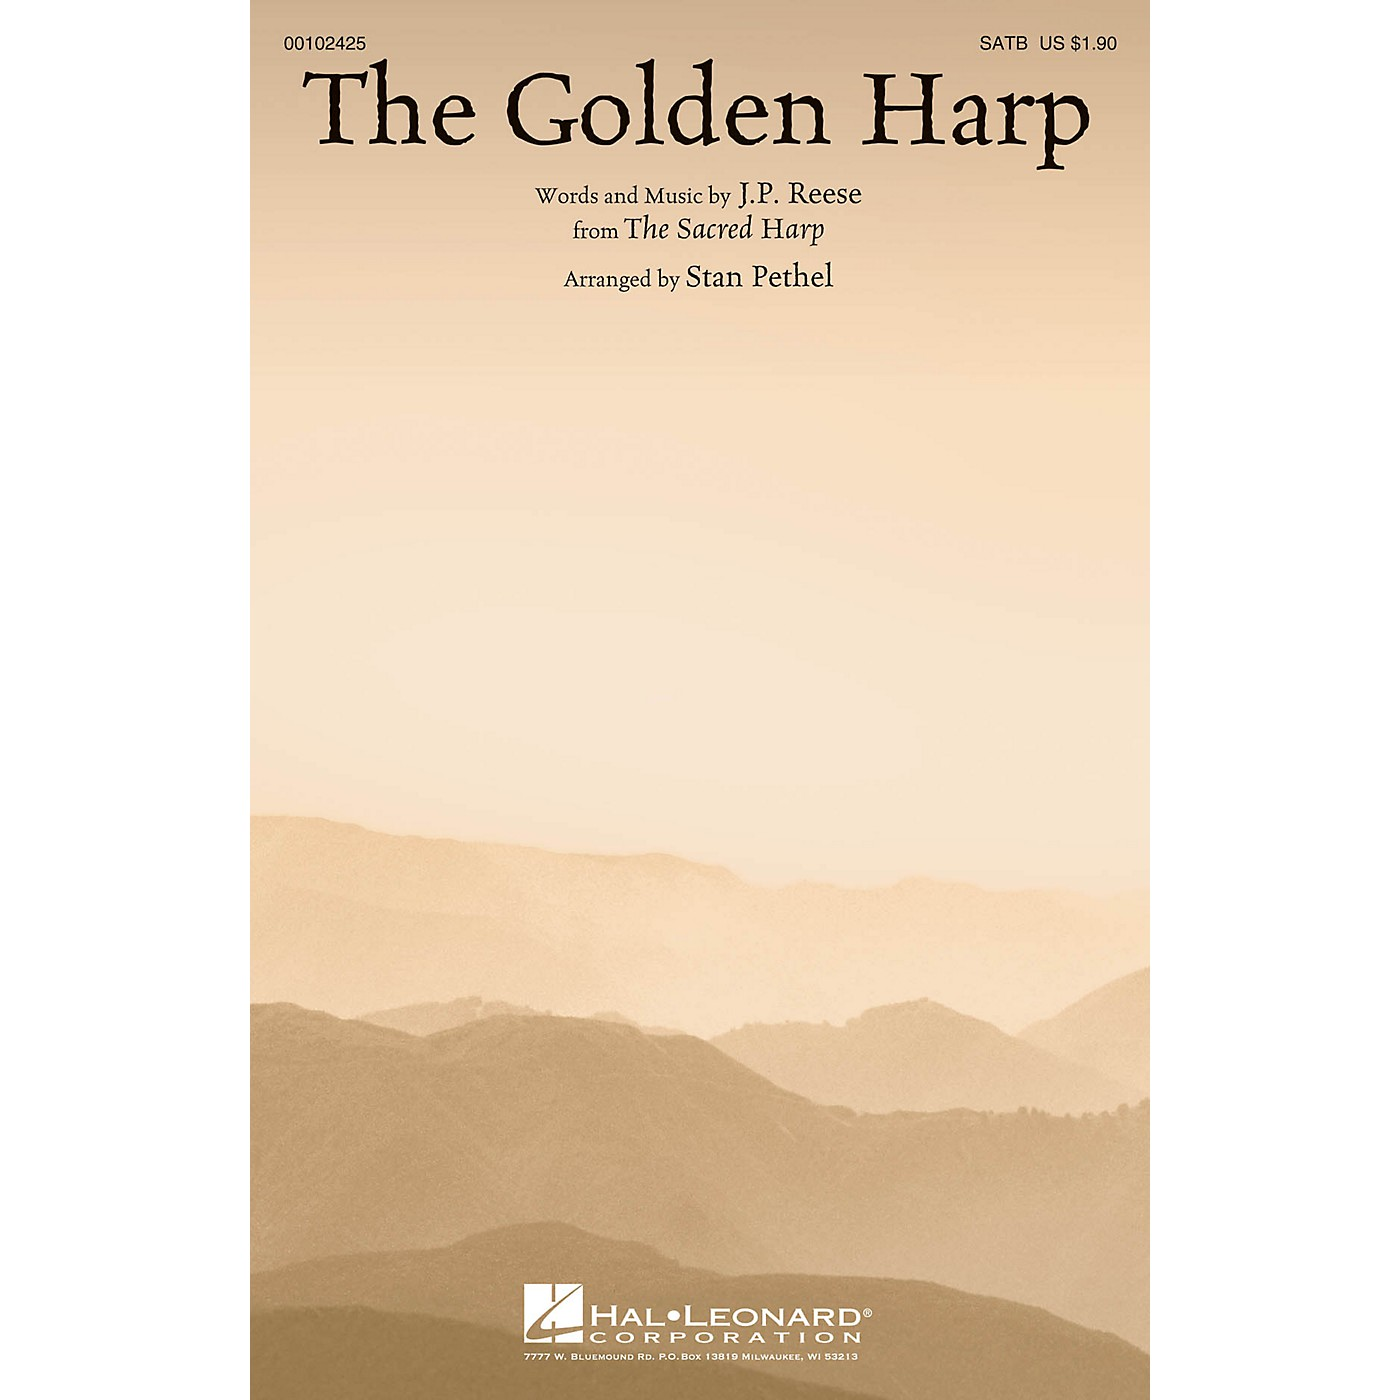 Hal Leonard The Golden Harp SATB arranged by Stan Pethel thumbnail